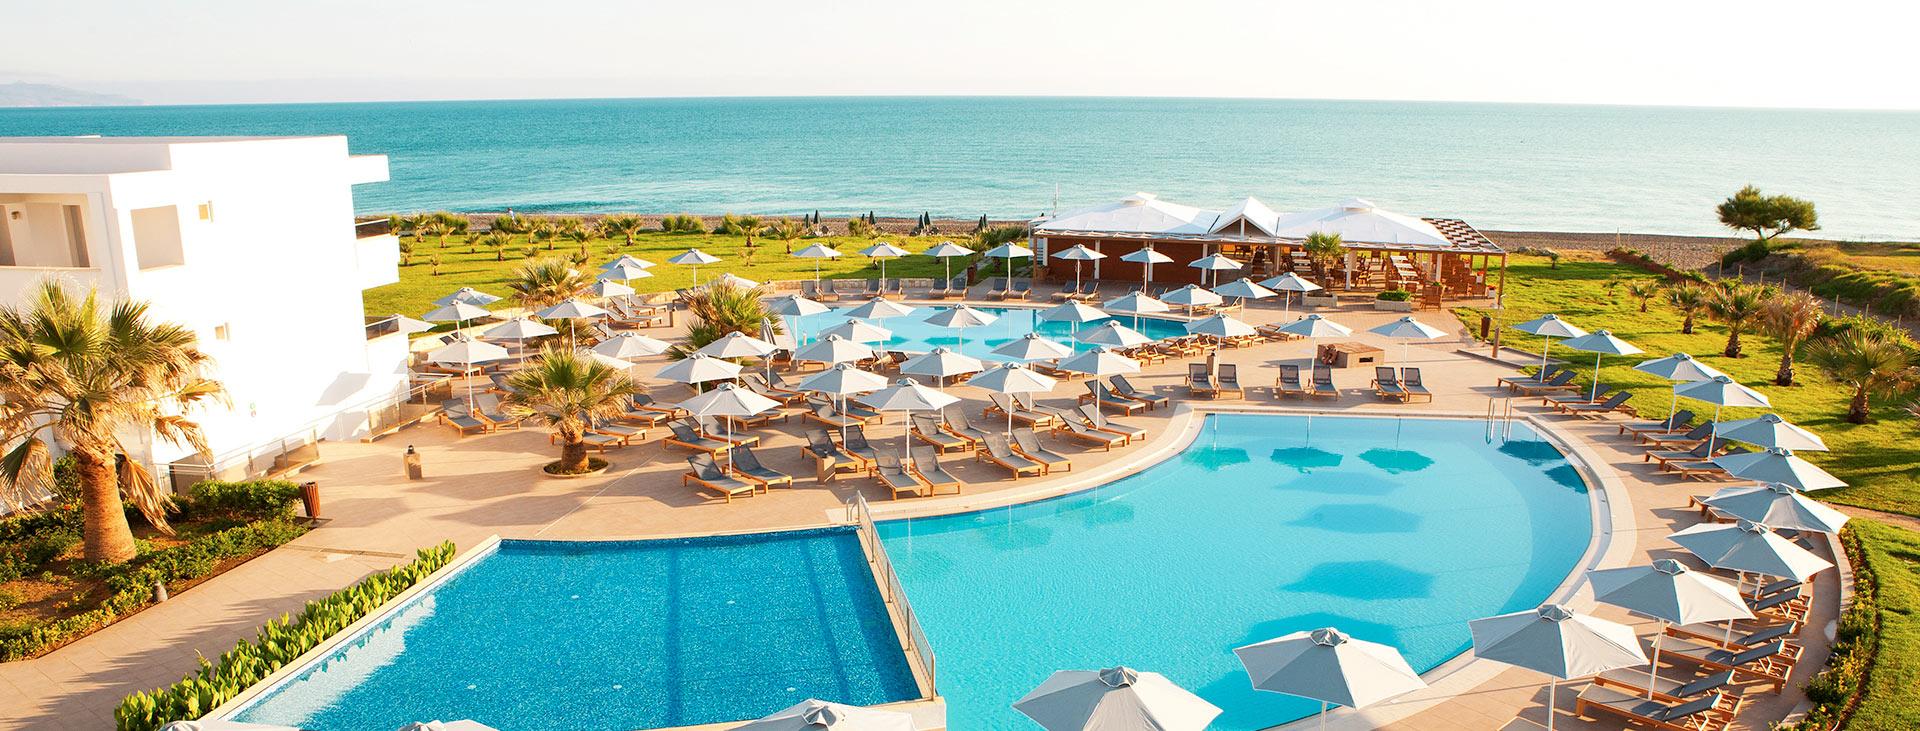 Sunprime Platanias Beach, Chaniakysten, Platanias, Kreta, Hellas